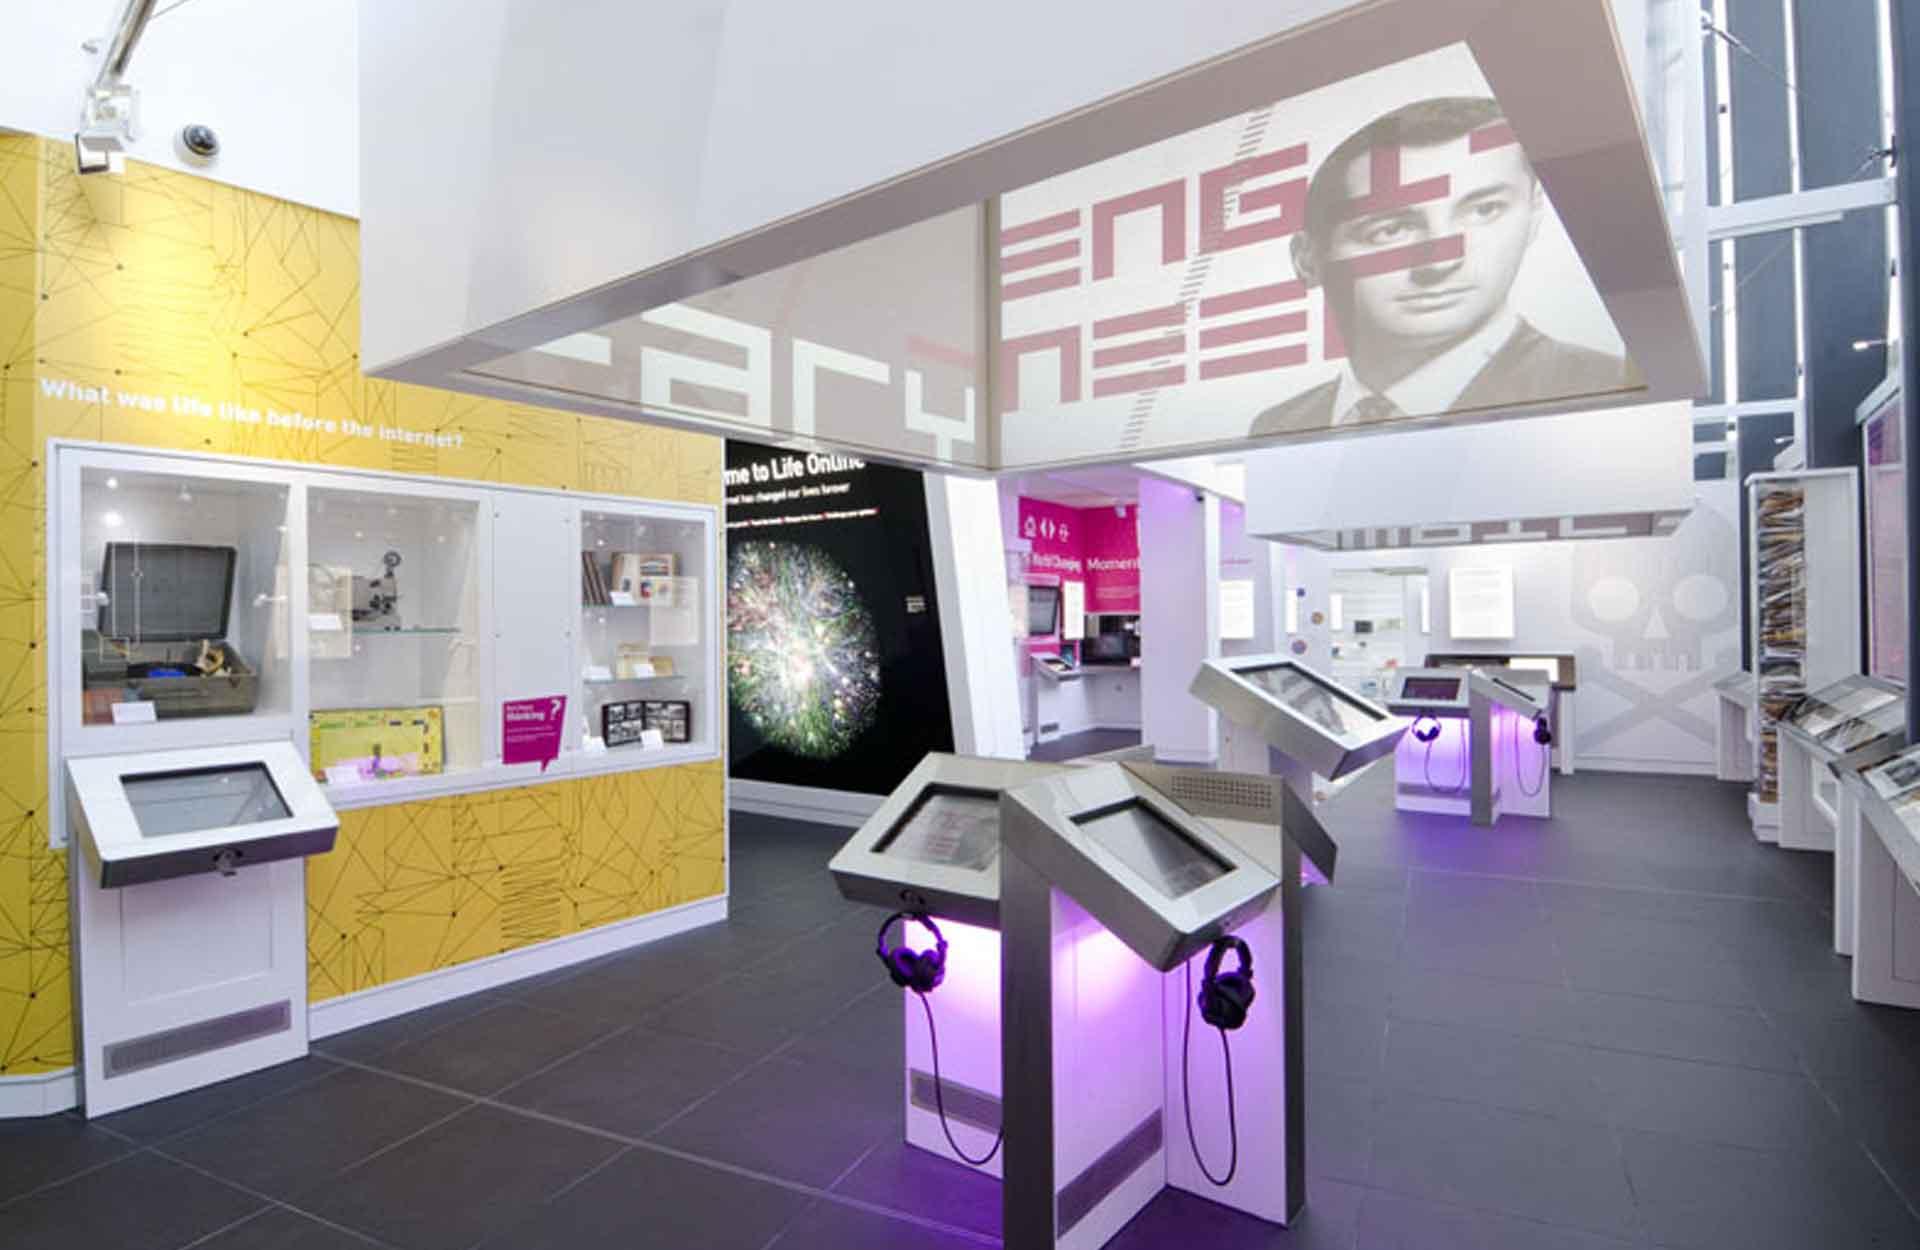 St Helens Creative Studio